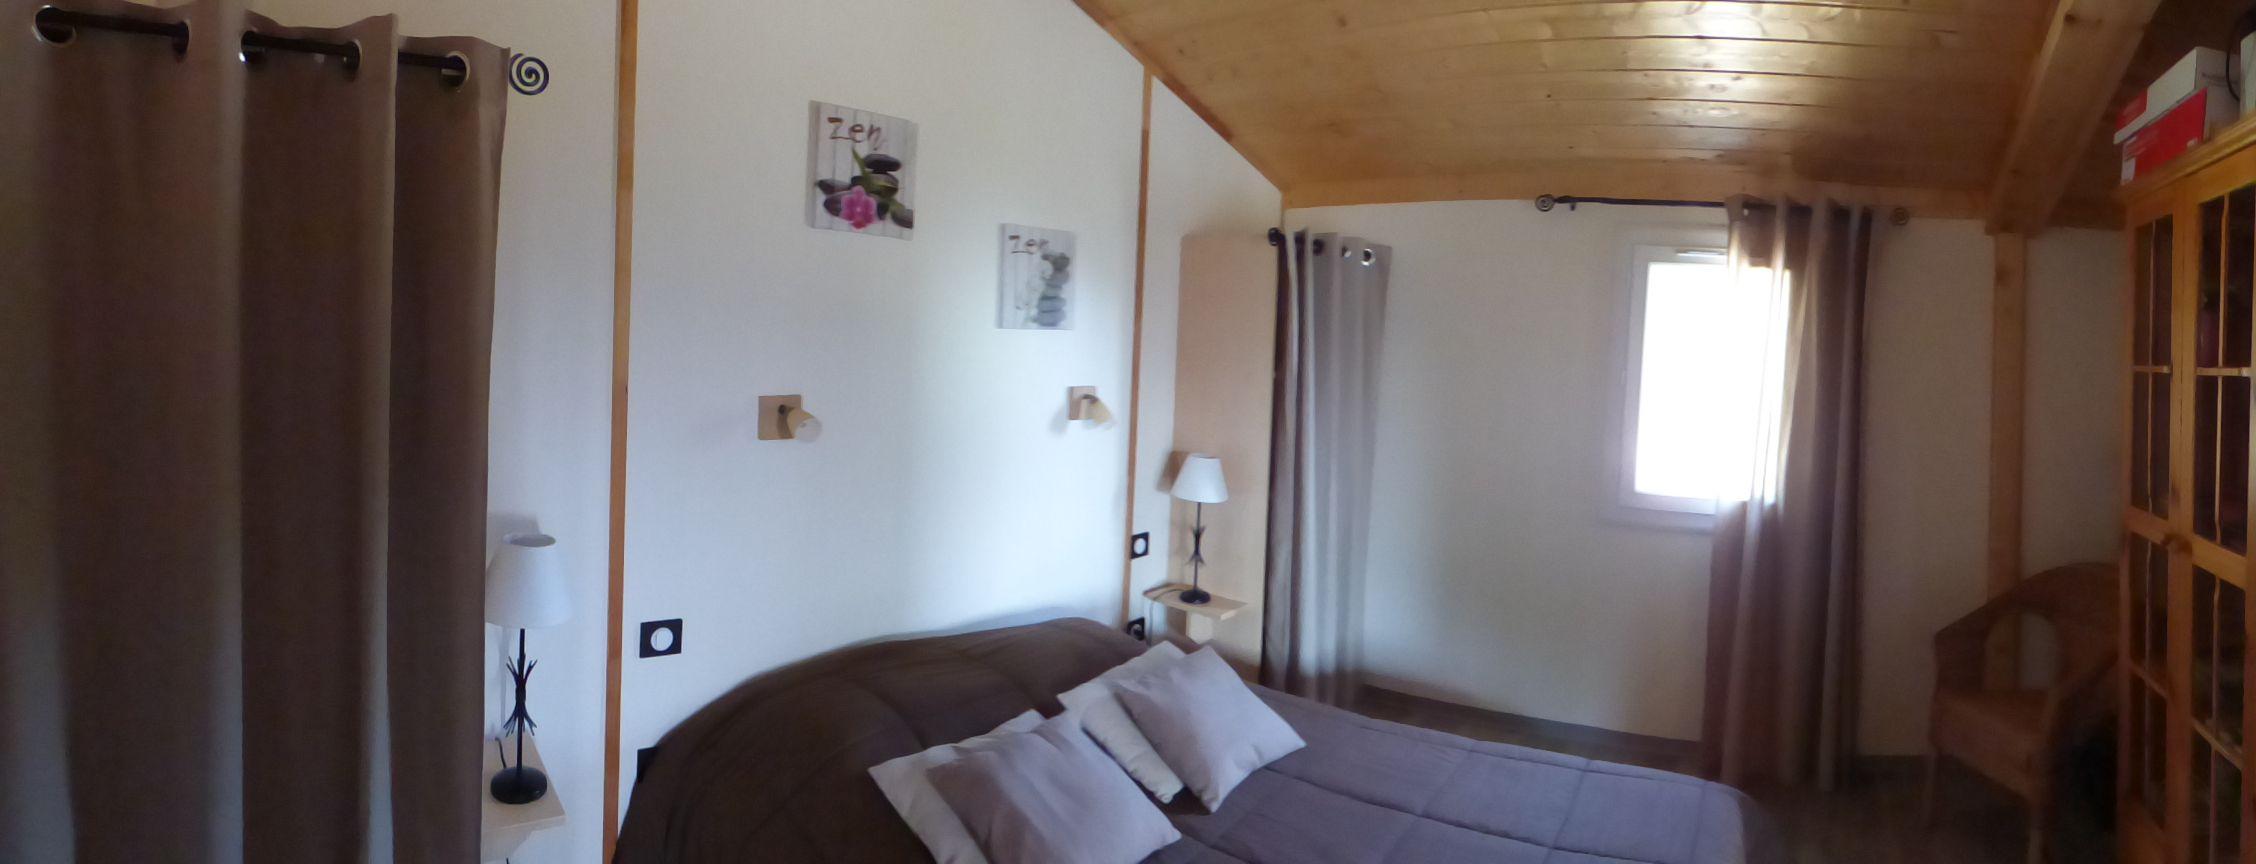 panoramique chambre